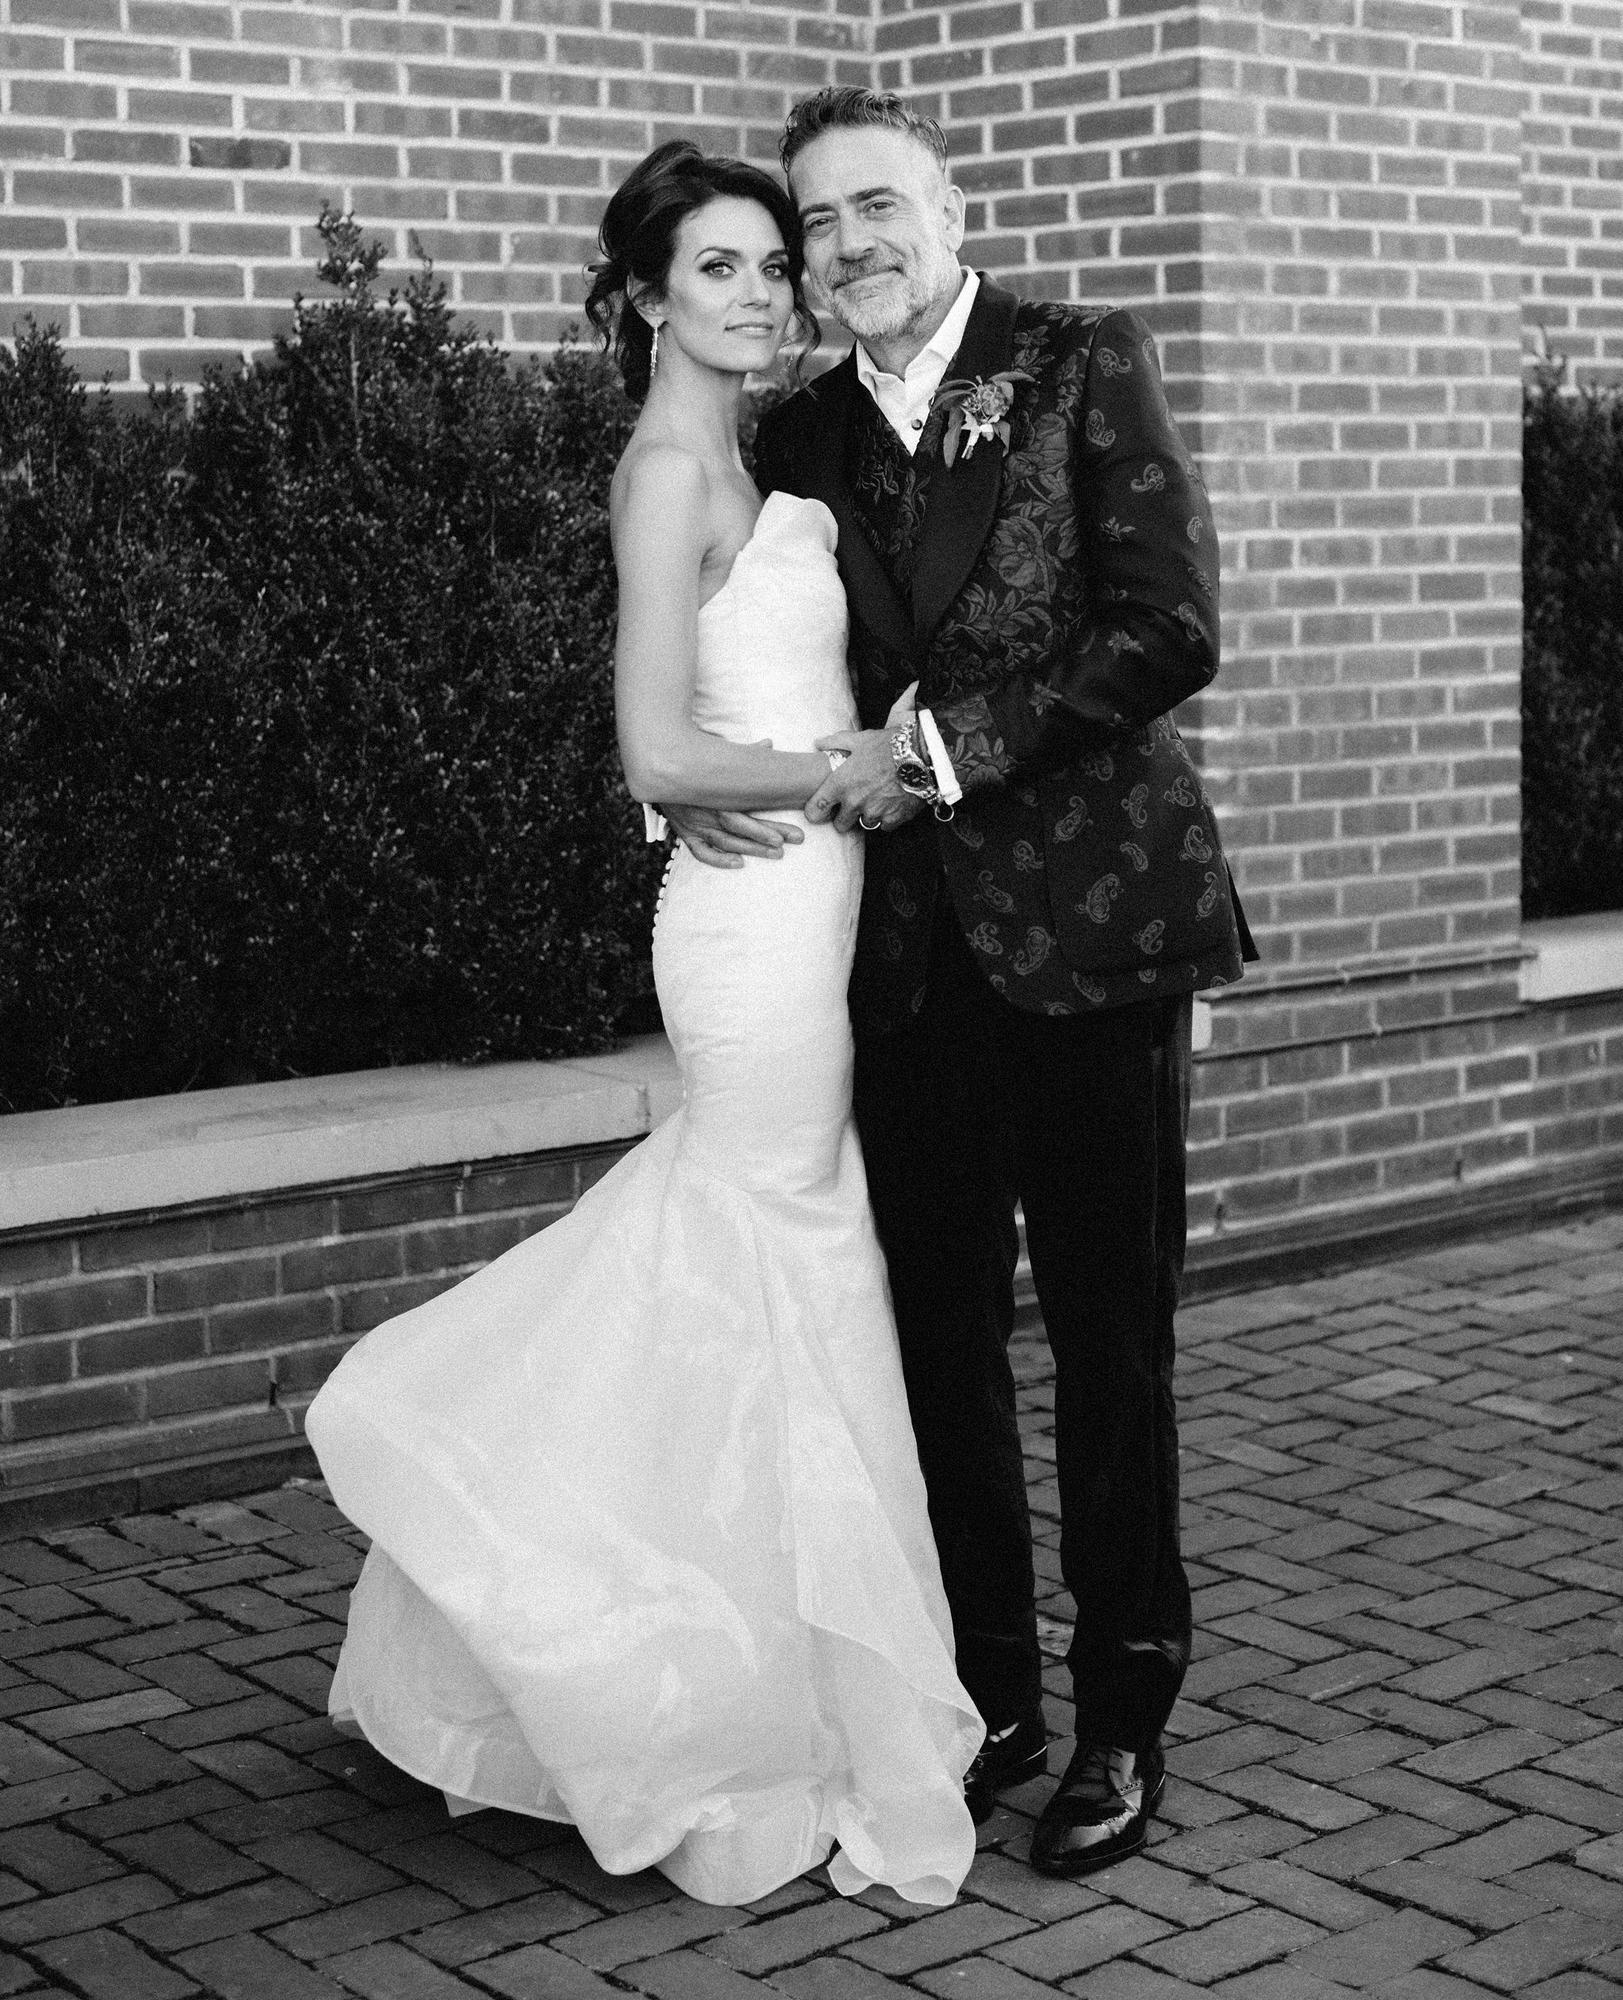 Hilarie-Burton-and-Jeffrey-Dean-Morgan-wedding-photo